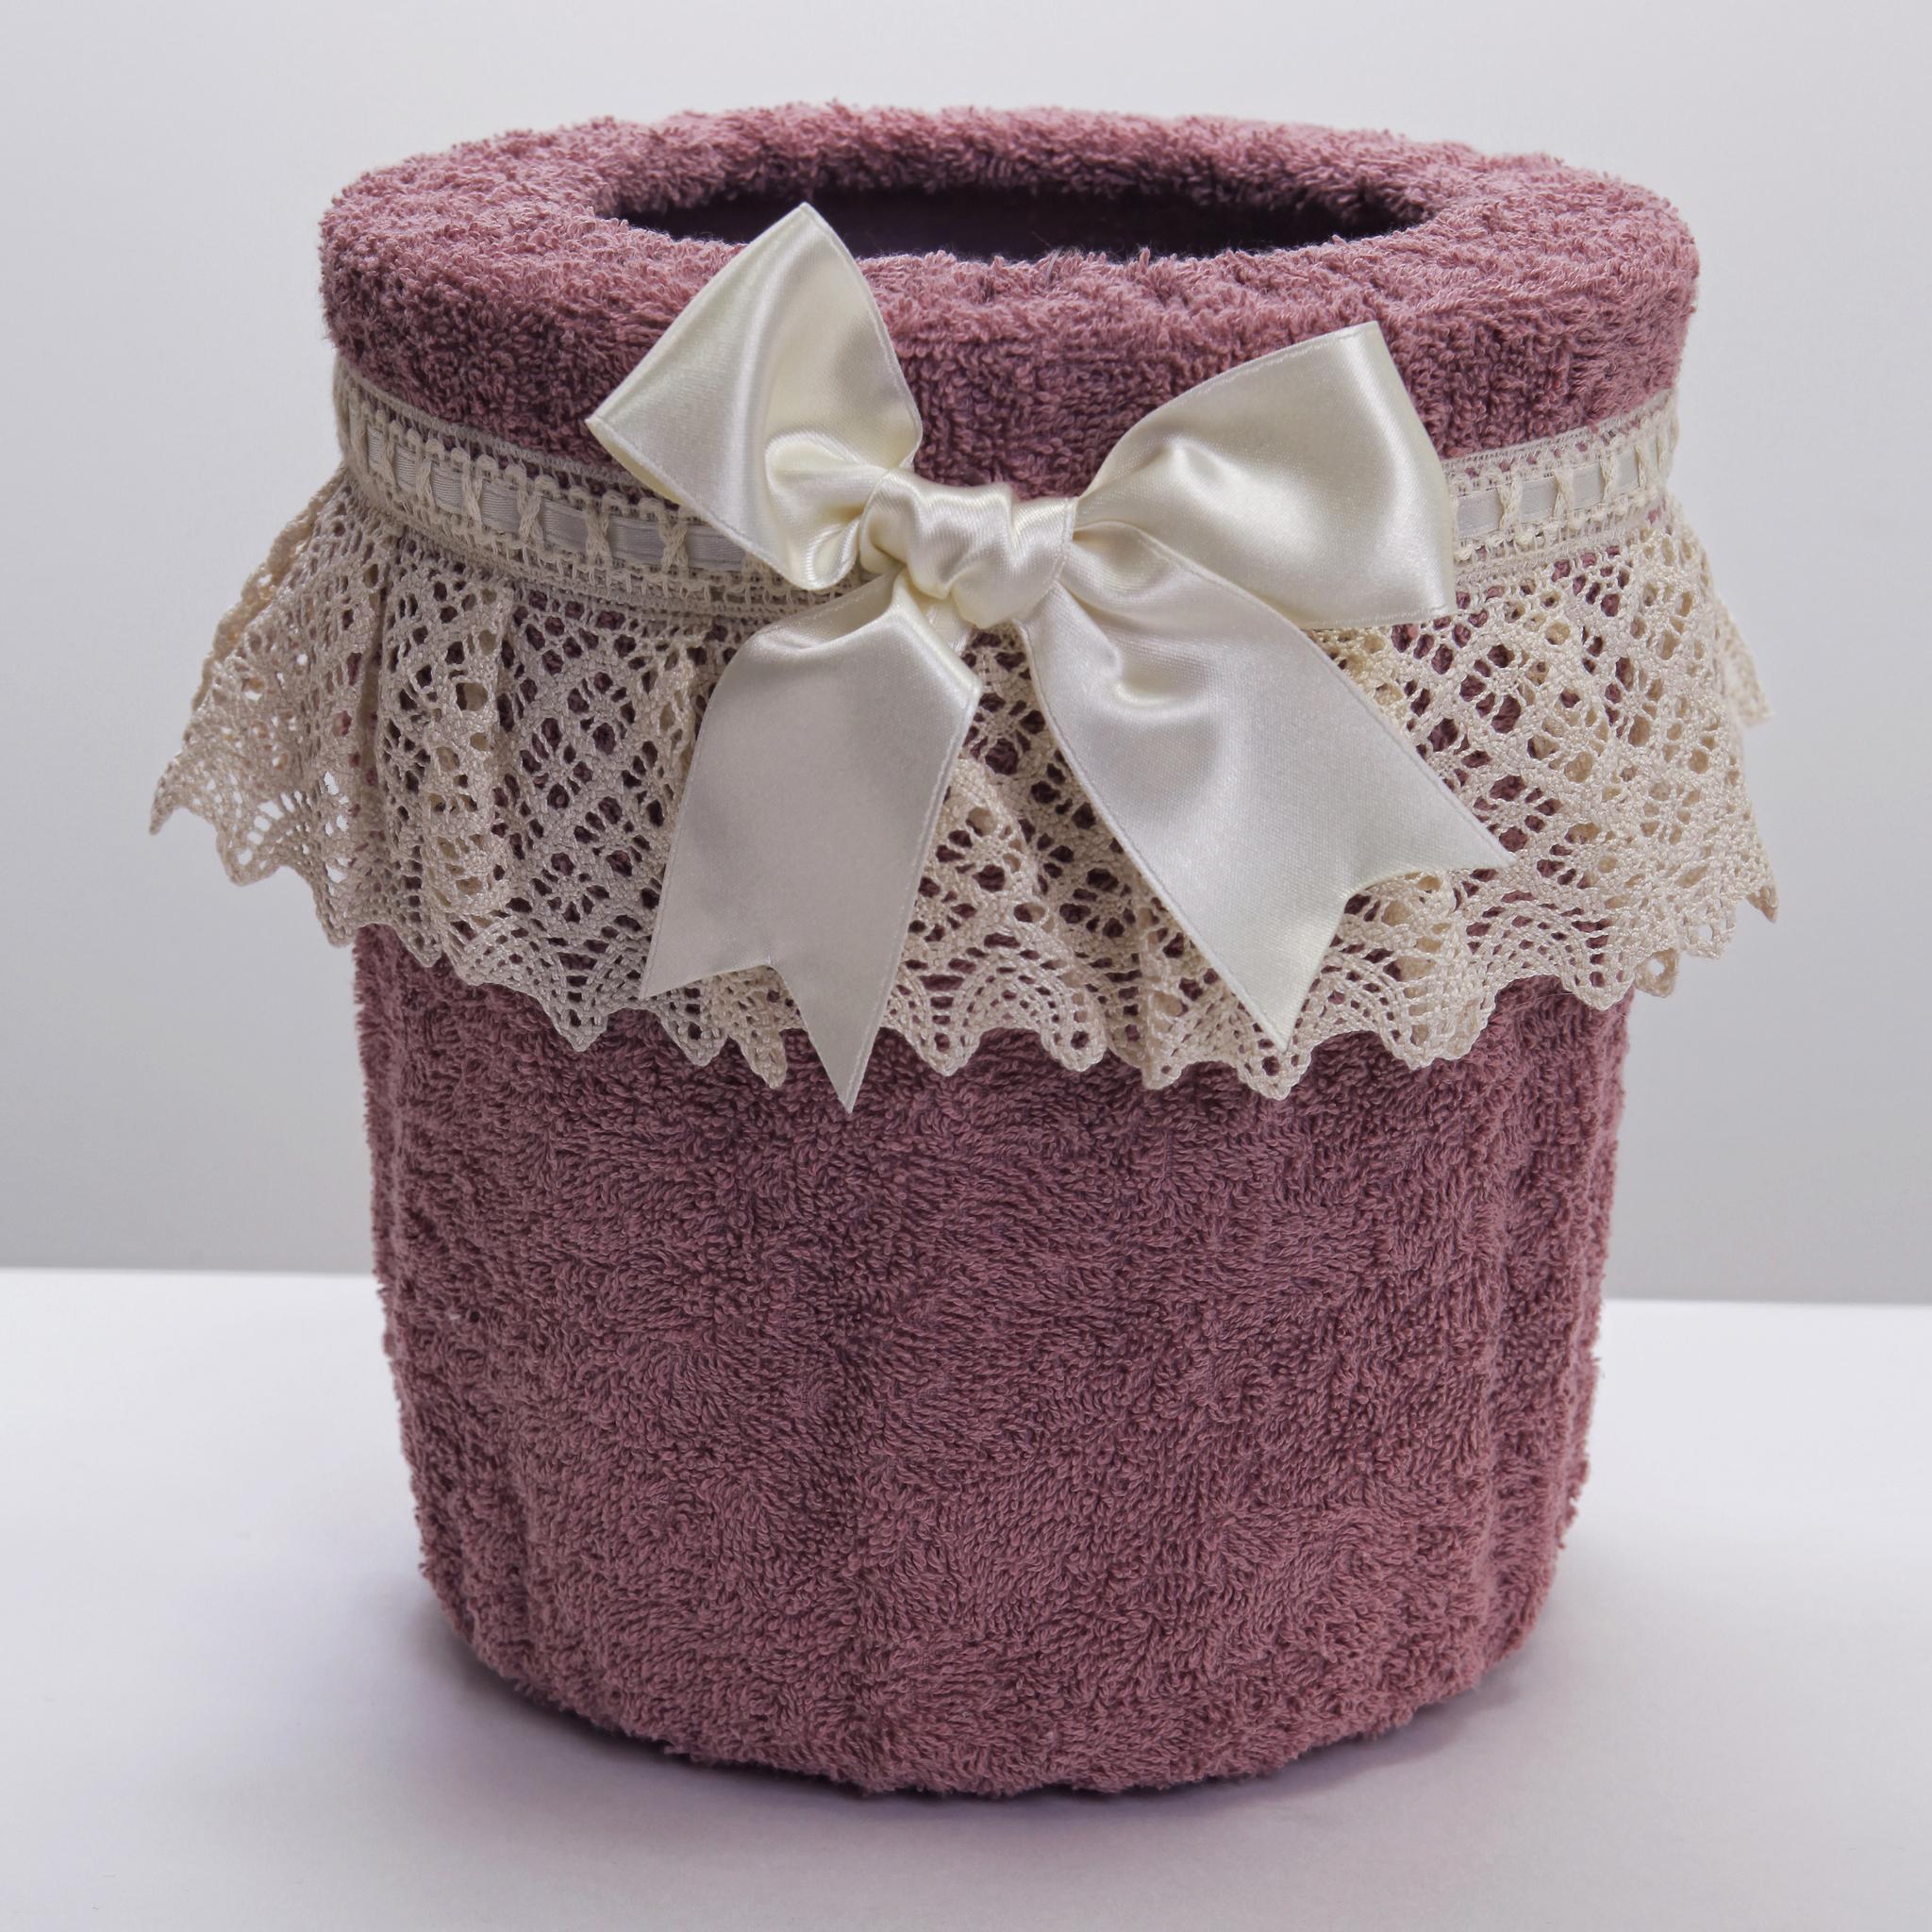 Ведра для мусора Ведро для мусора в ванную 20 Old Florence Rombetti розовое vedro-dlya-musora-v-vannuyu-rombetti-ot-old-florence-italiya-rozovyy-tsvet.JPG